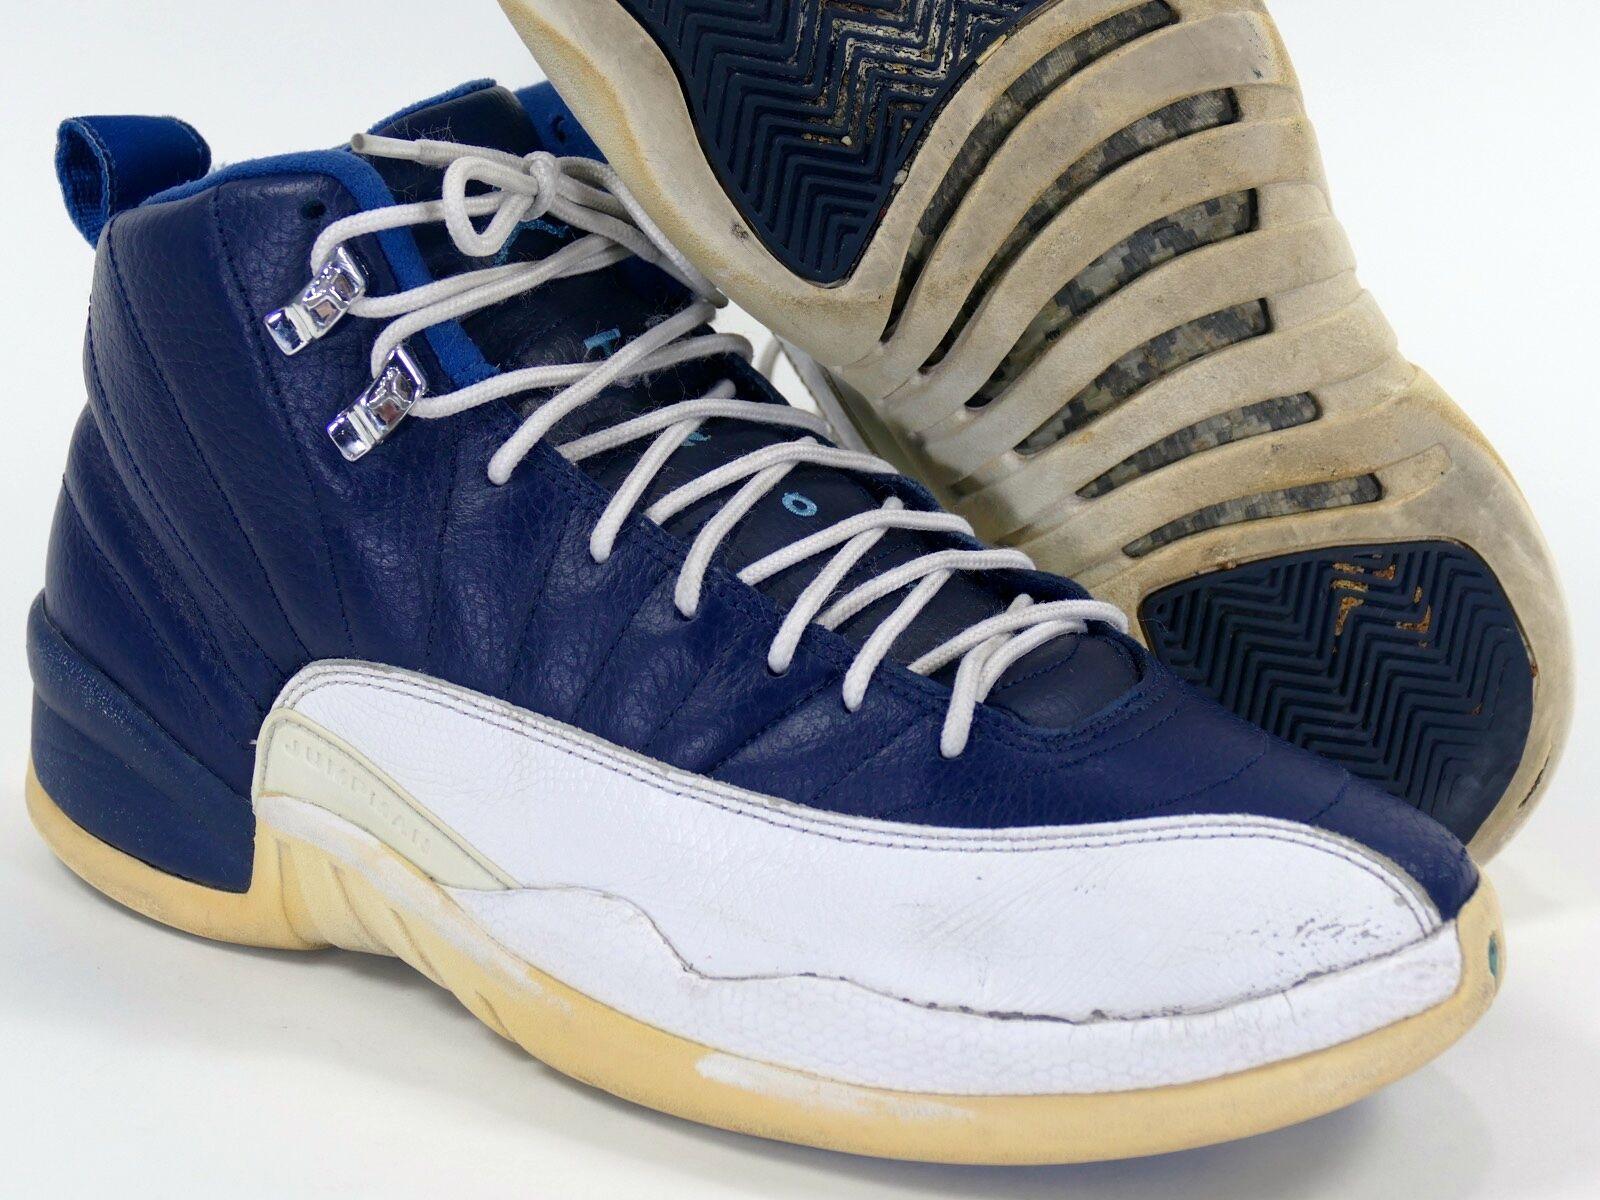 Jordan XII Sz 9.5 Obsidian/University Blue - air retro 2012 xiii 12 french navy Cheap women's shoes women's shoes